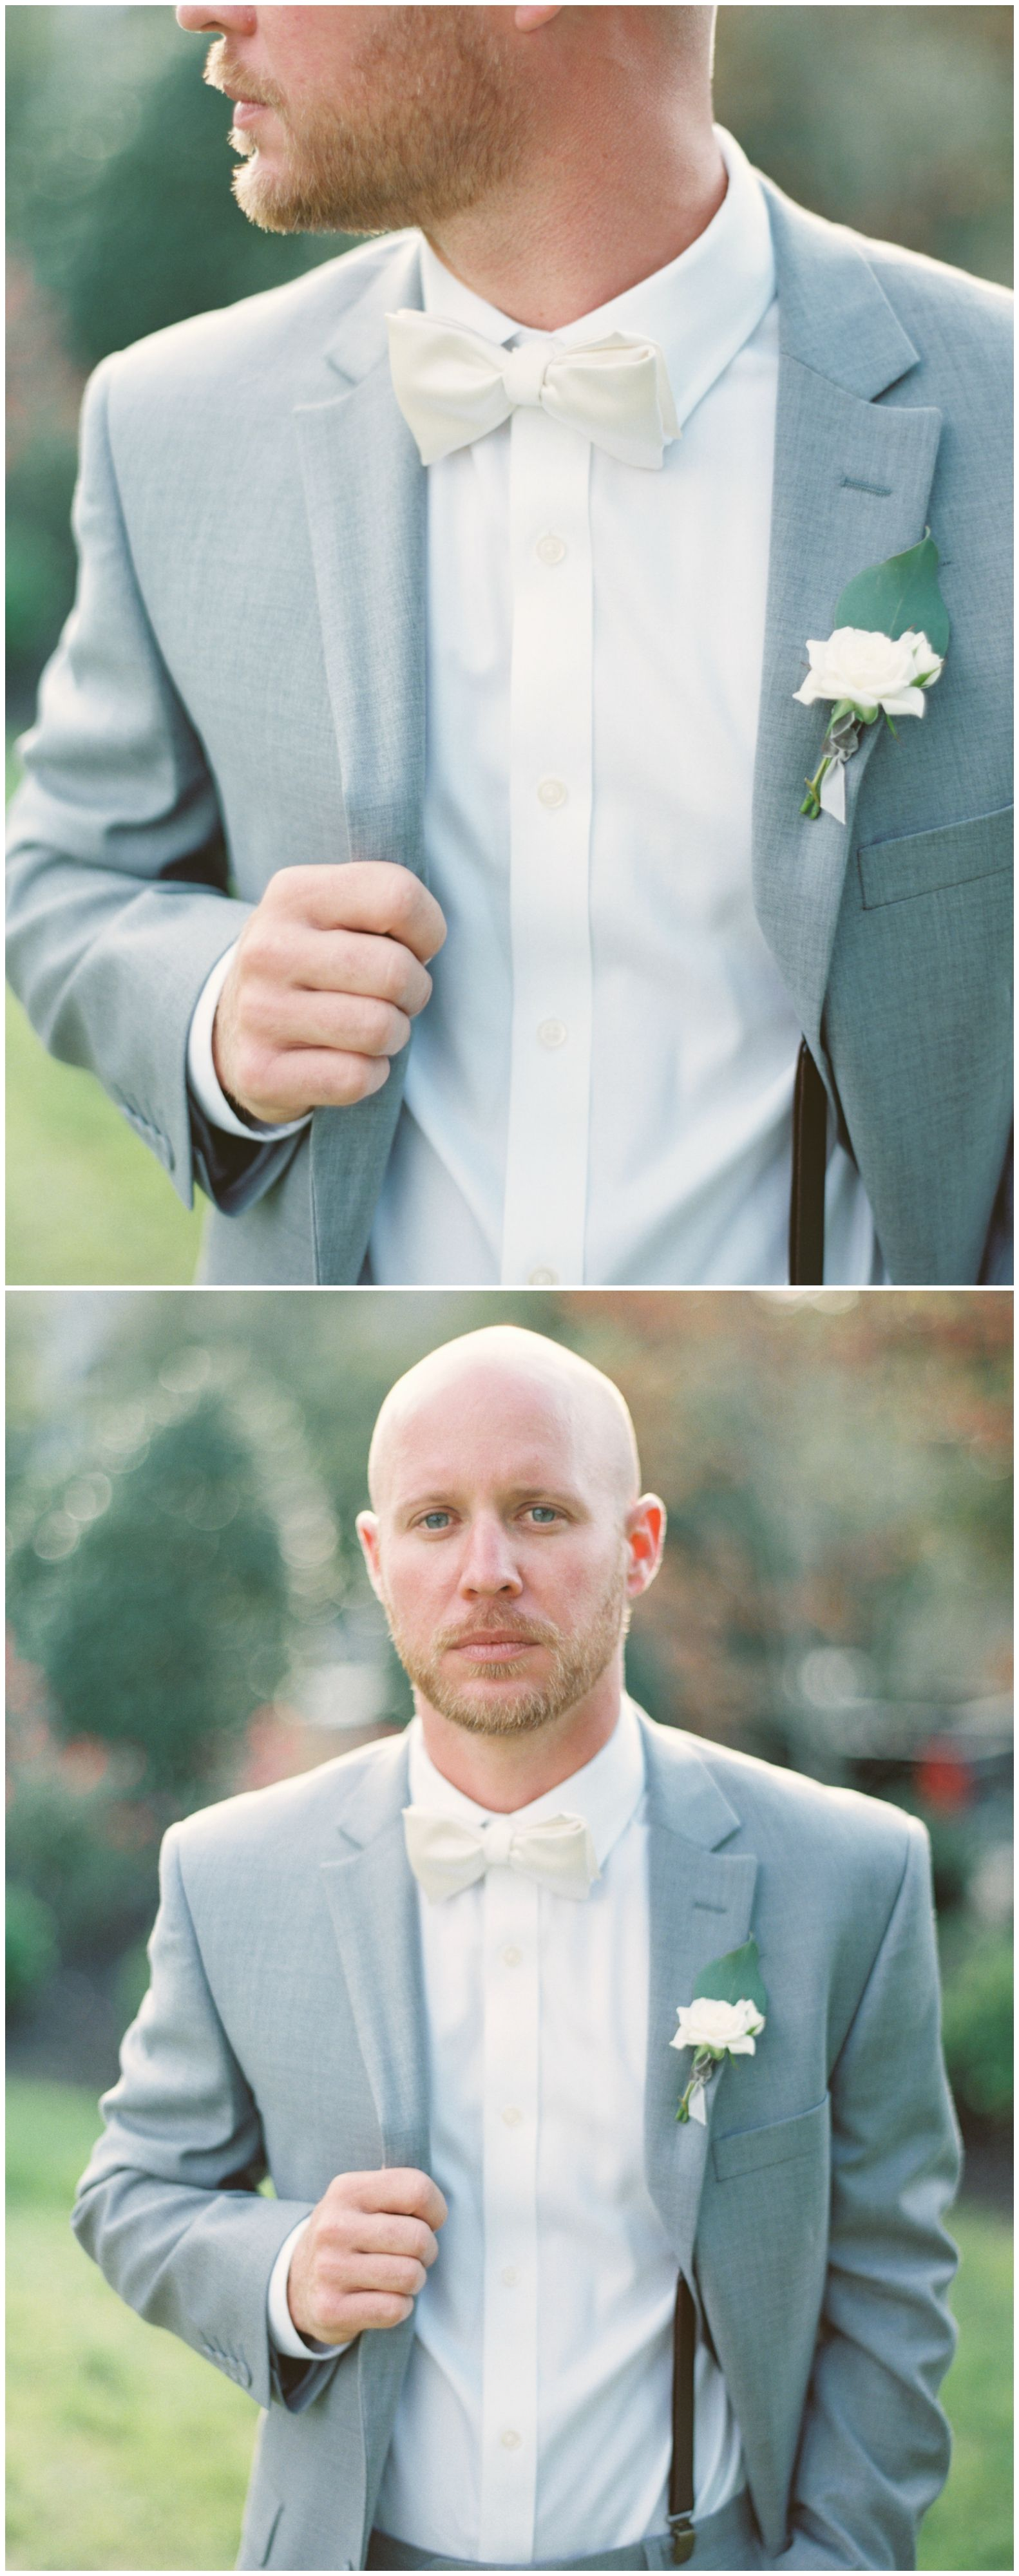 The Smarter Way to Wed | Wedding styles, Wedding and Wedding